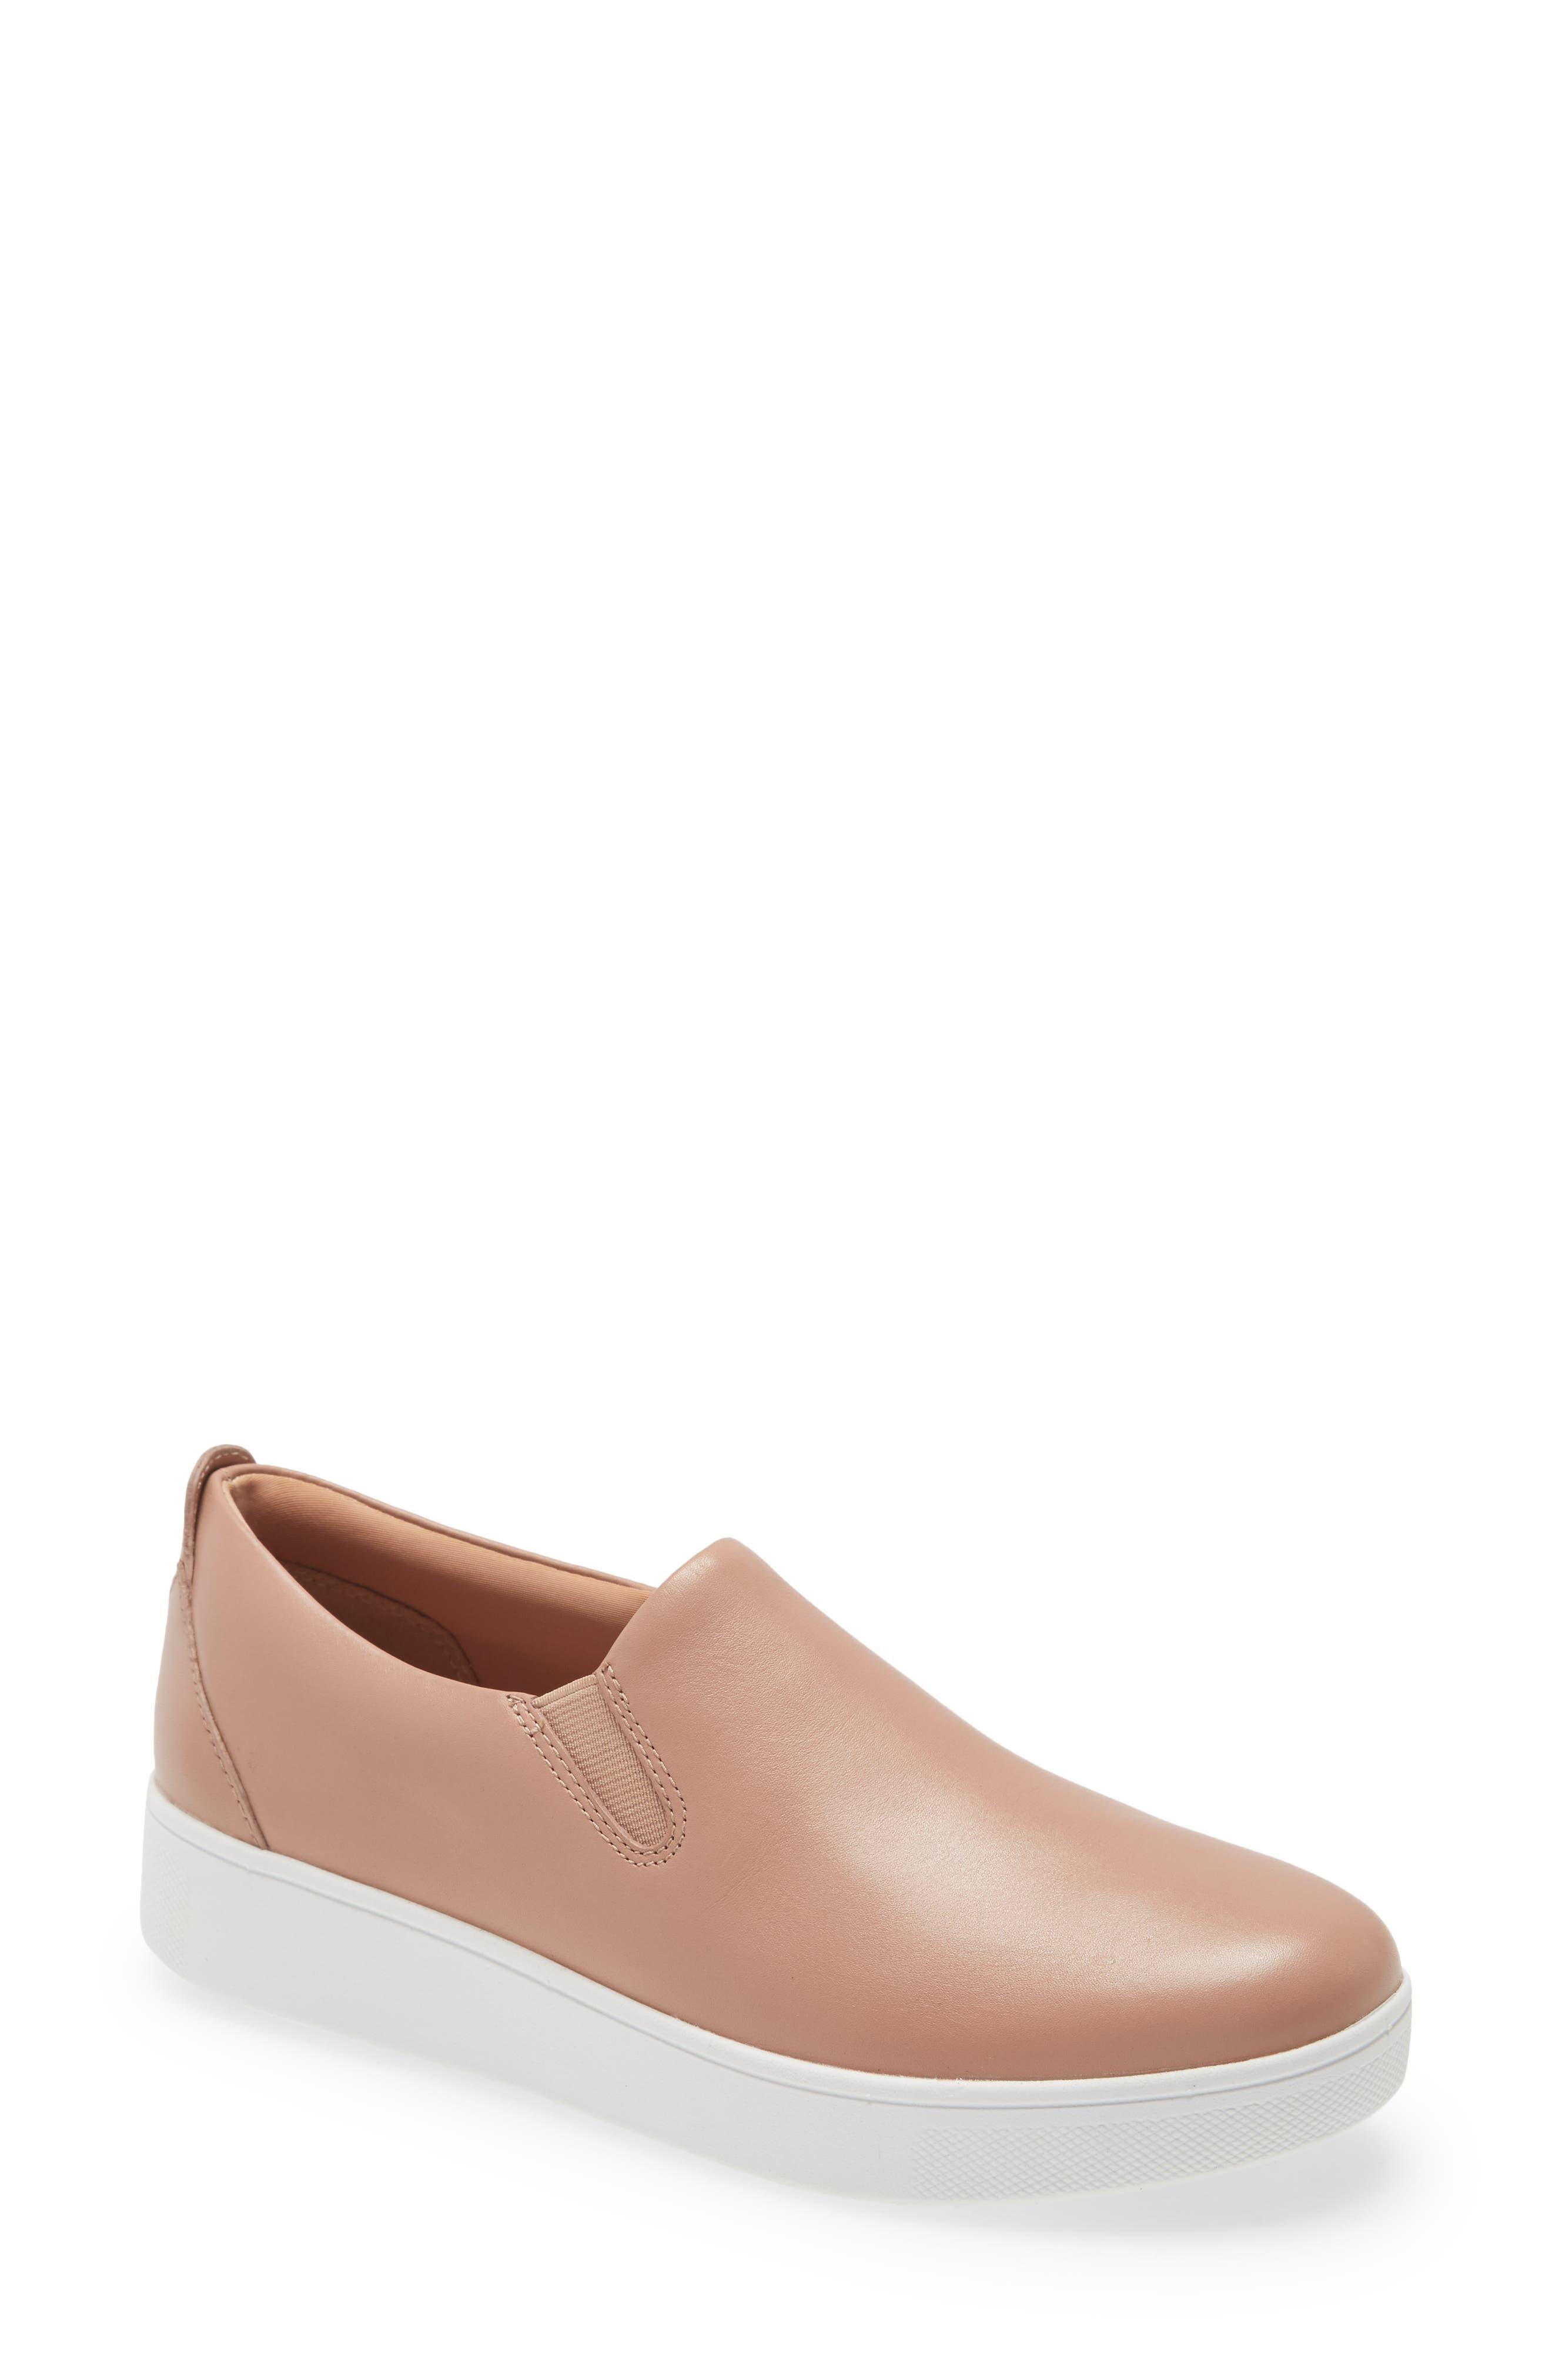 Sania Skates Slip-On Sneaker